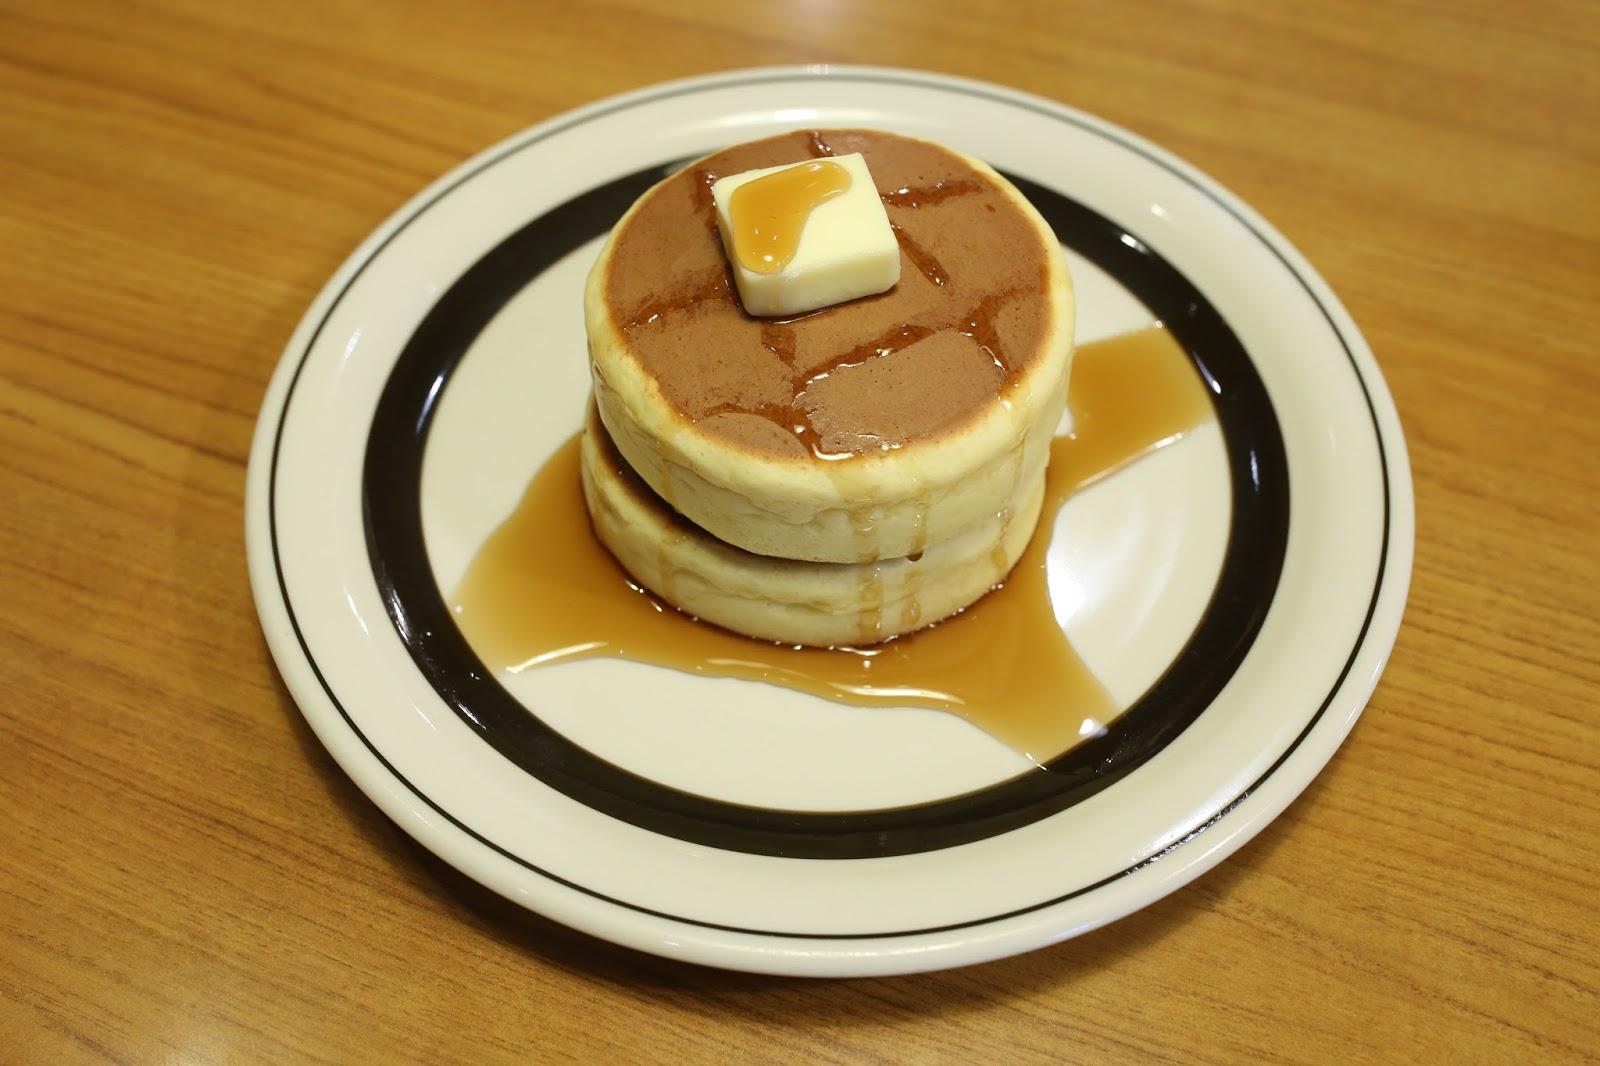 Japanese foodie japanese pancakes hot cakes at japanese pancakes hot cakes at pinocchiopinokio tokyo japan ccuart Images